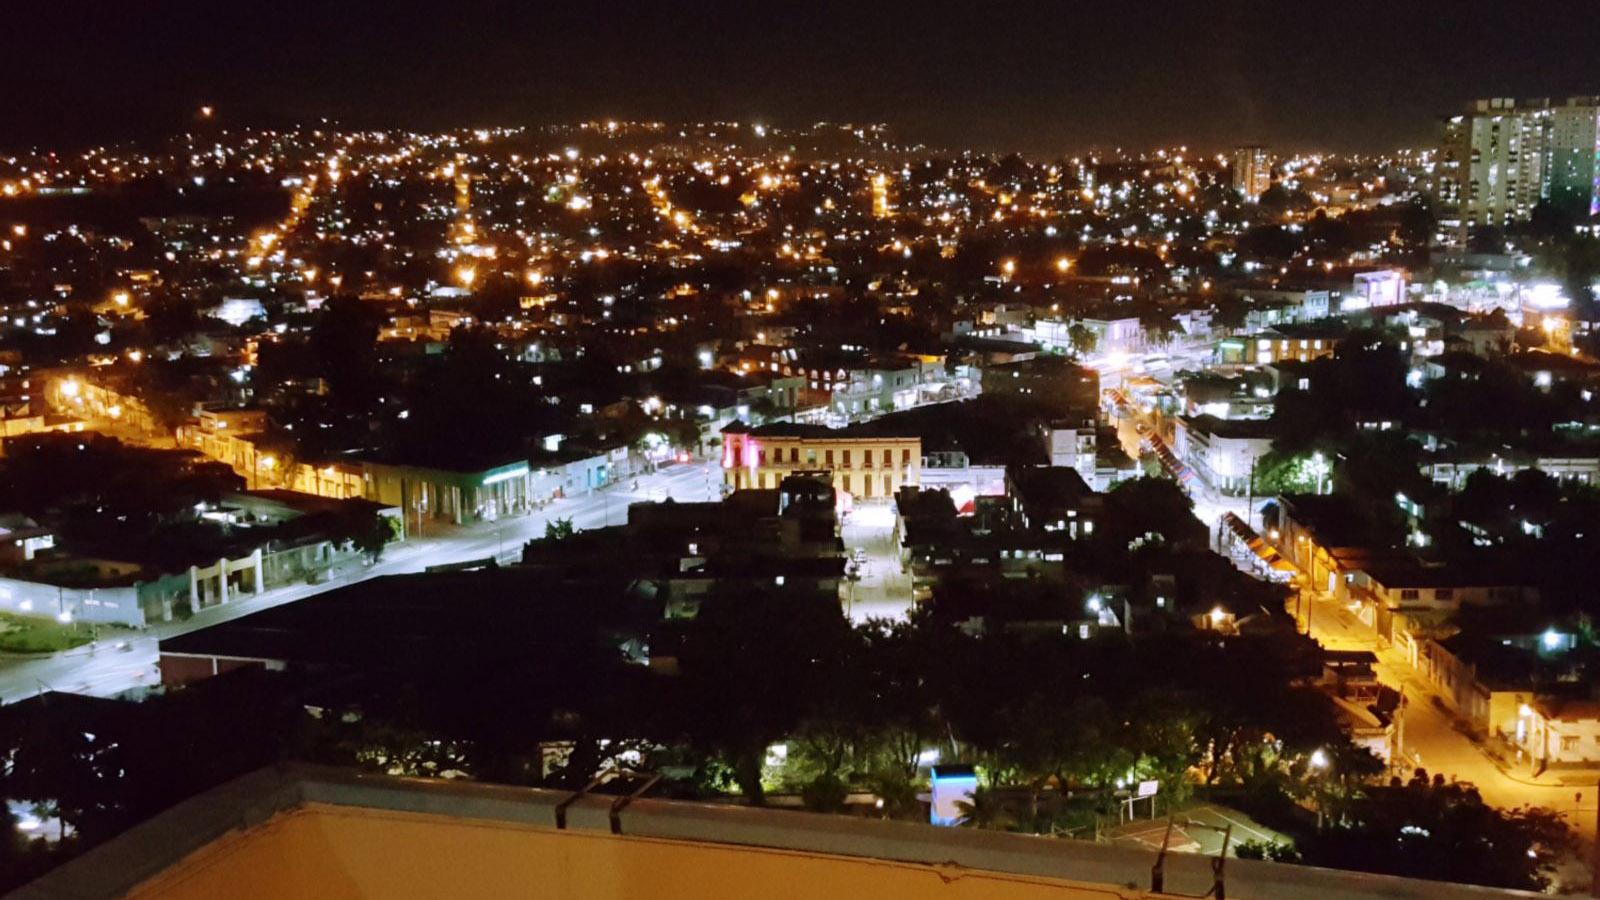 140 Santiago de Cuba